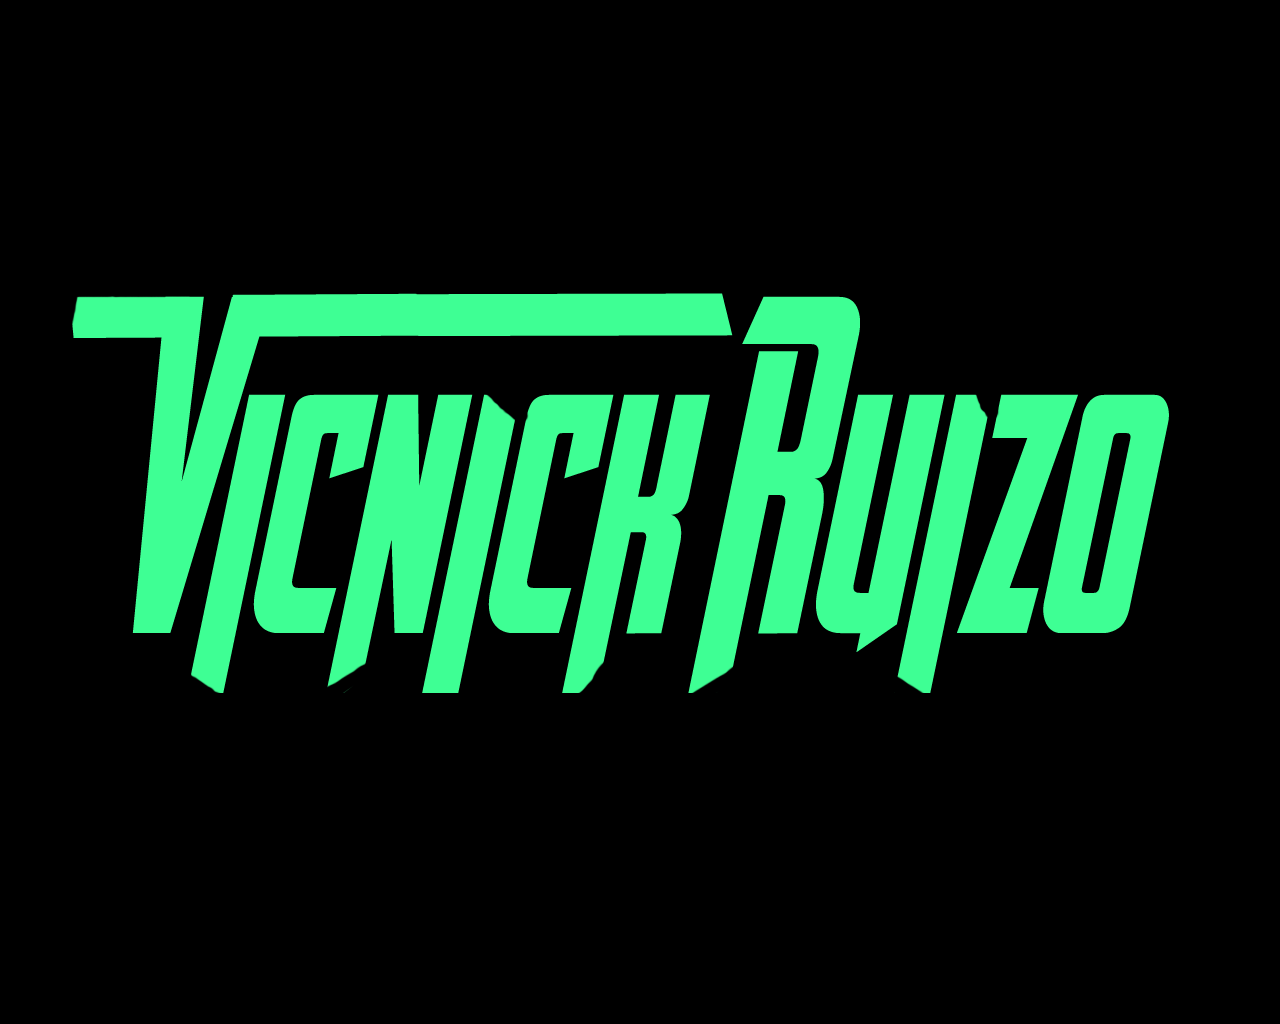 VNR | VicNick Ruizo